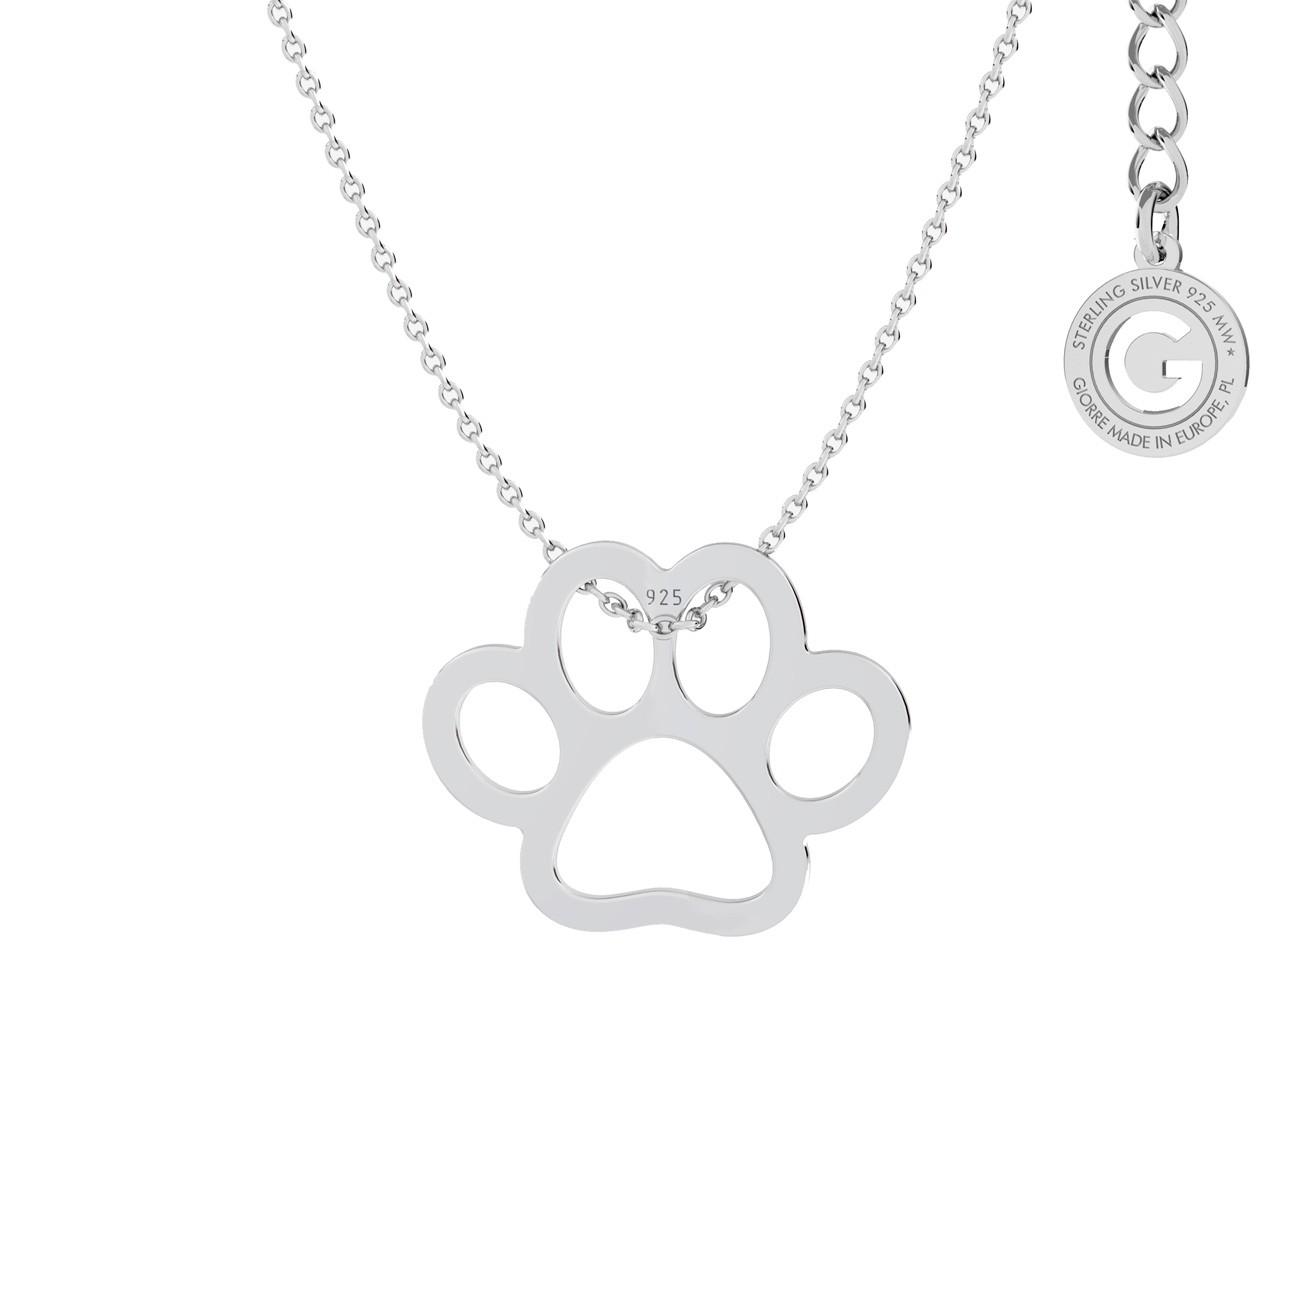 Srebrny naszyjnik psia łapa, srebro 925